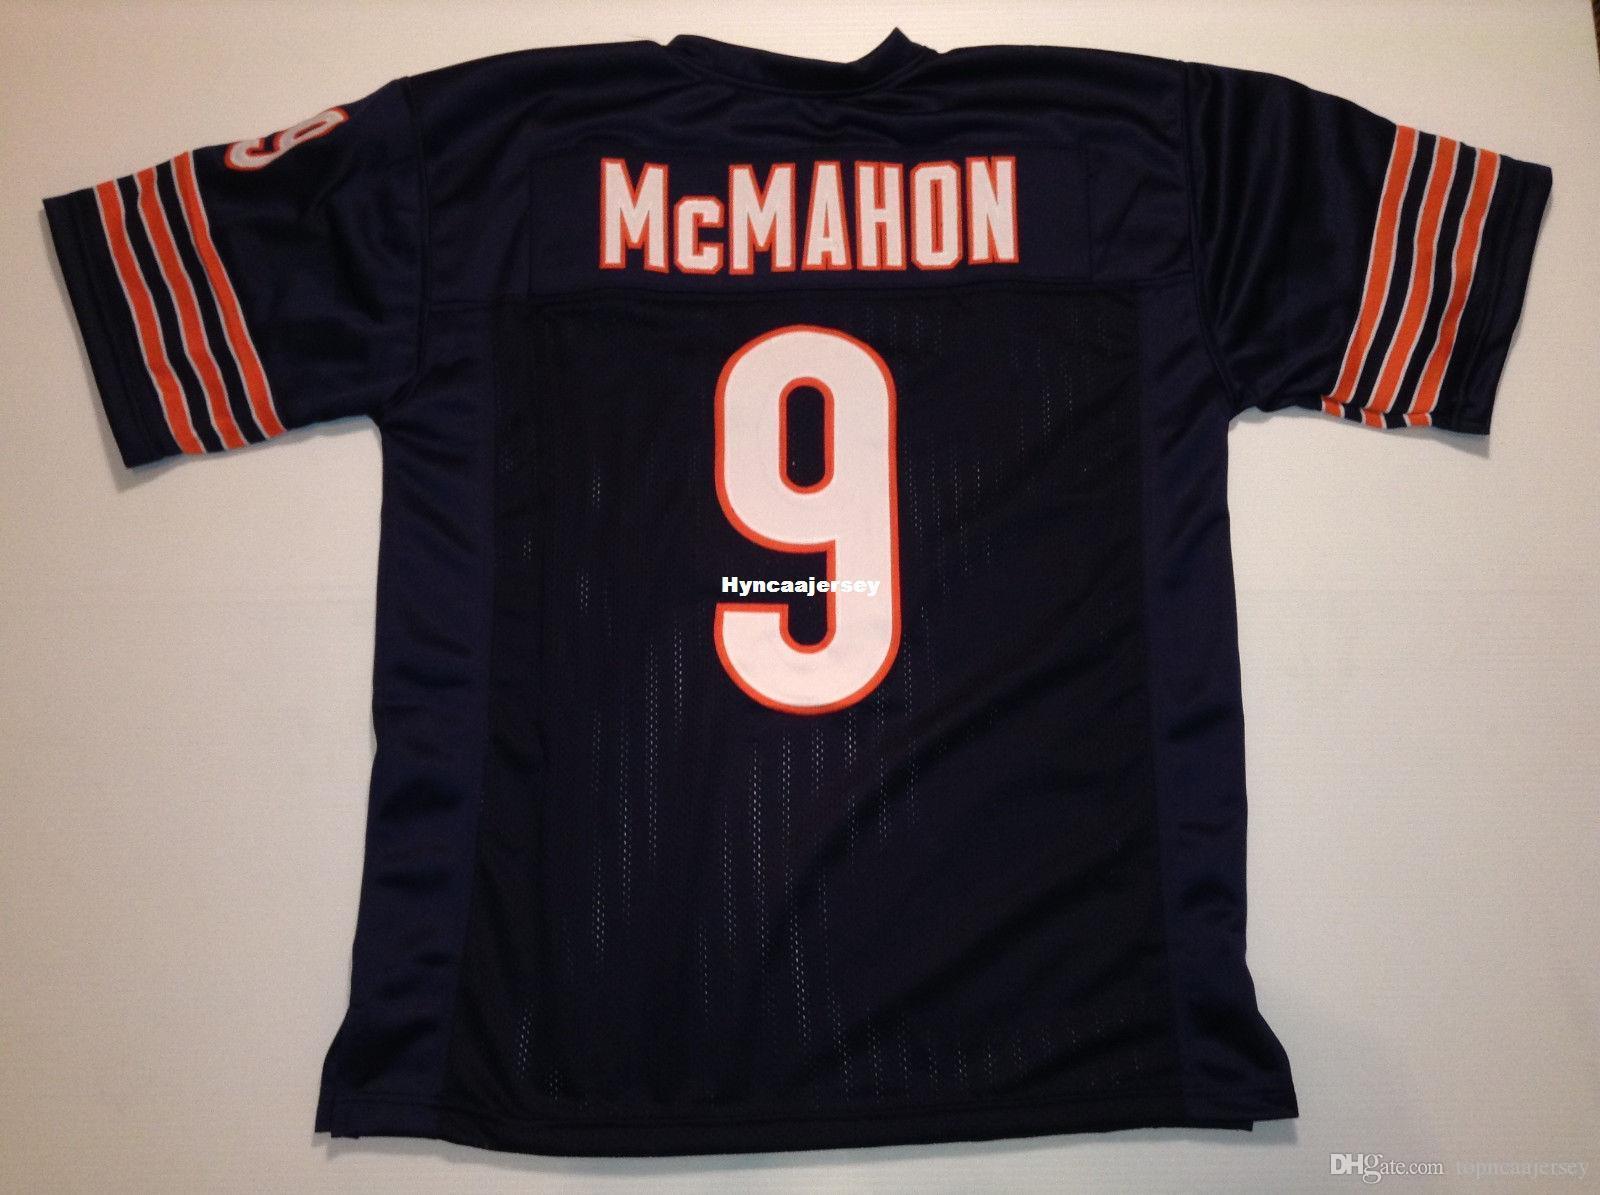 reputable site 6ef65 fbf6b Cheap Retro custom Sewn Stitched #9 Jim McMahon Blue MITCHELL & NESS Jersey  Men's Football Jerseys College NCAA